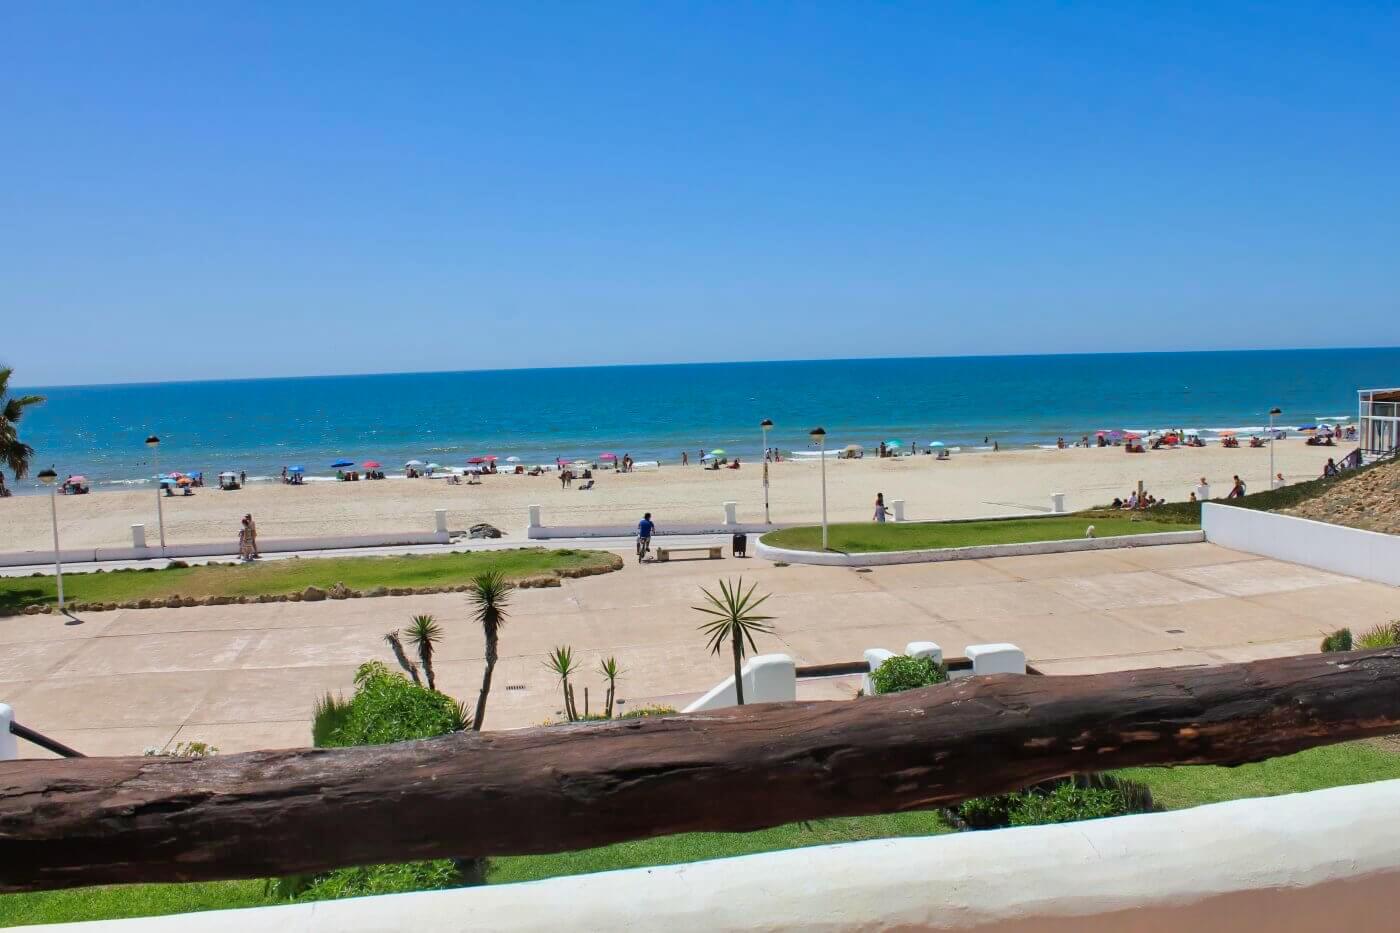 Alquiler De Chalet En Matalasca 241 As En Primera Linea De Playa